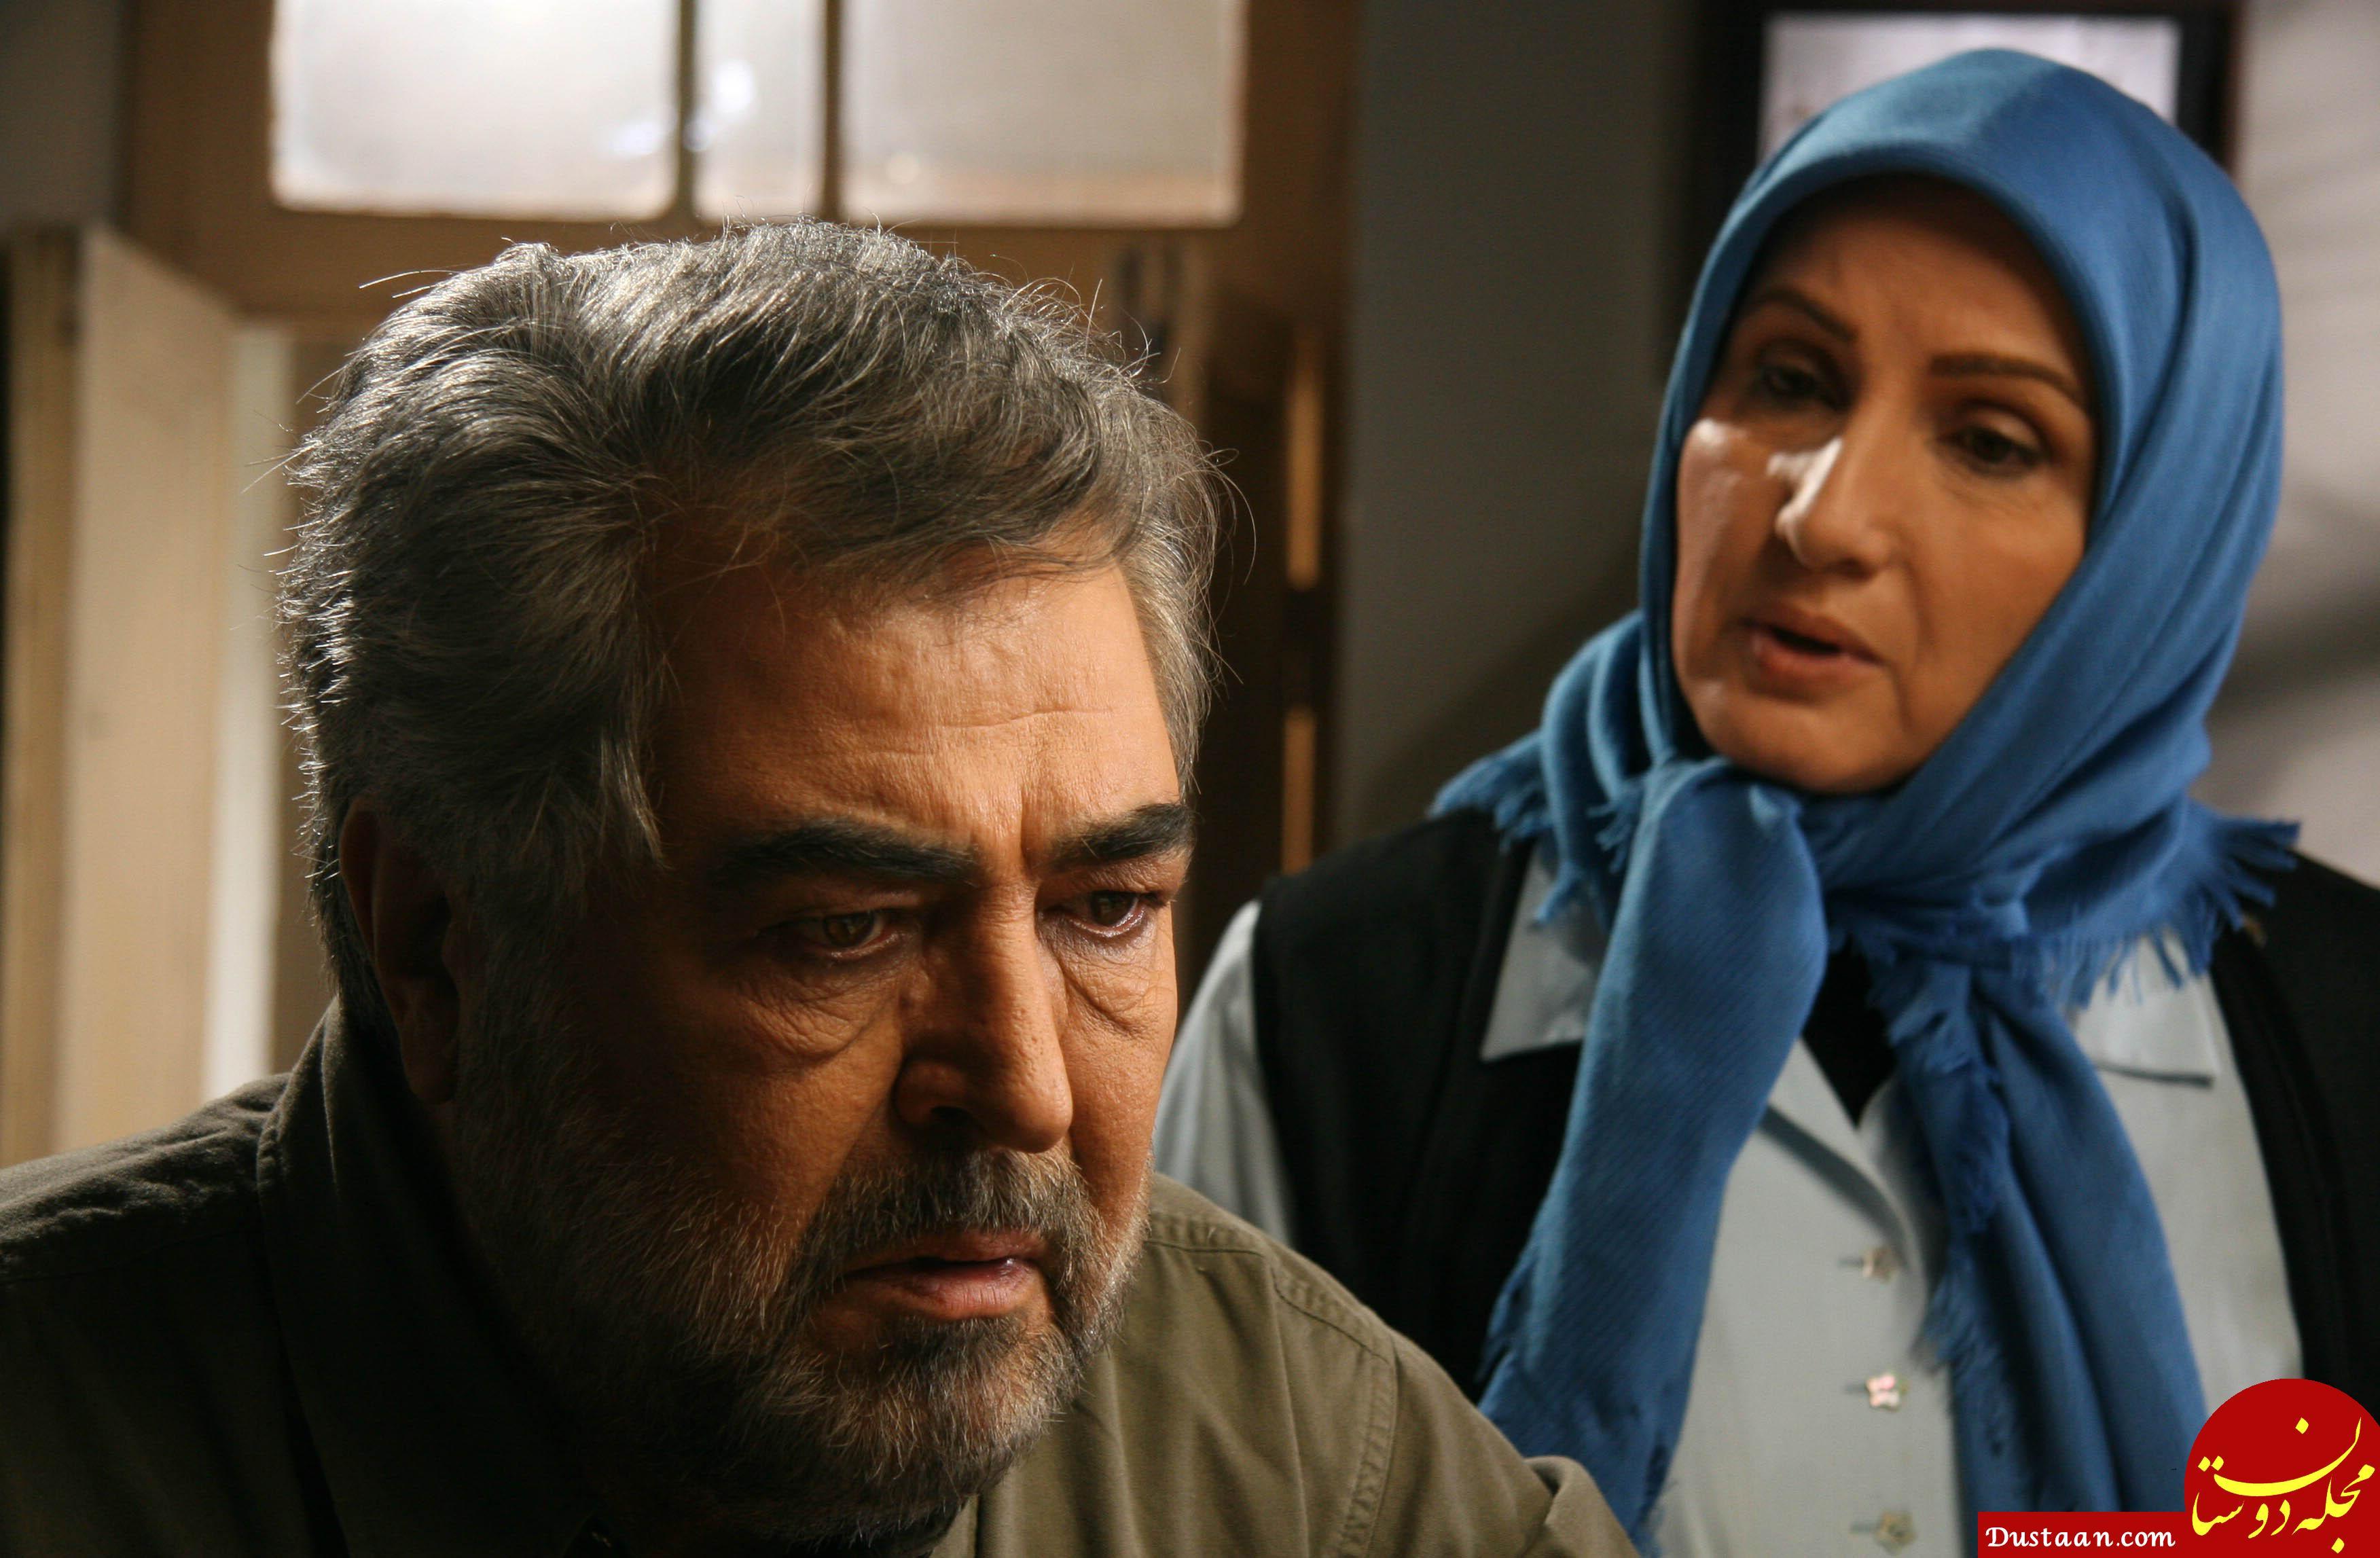 www.dustaan.com جنجال بر سریال «ستایش»/ چه کسی طراح این سریال است؟